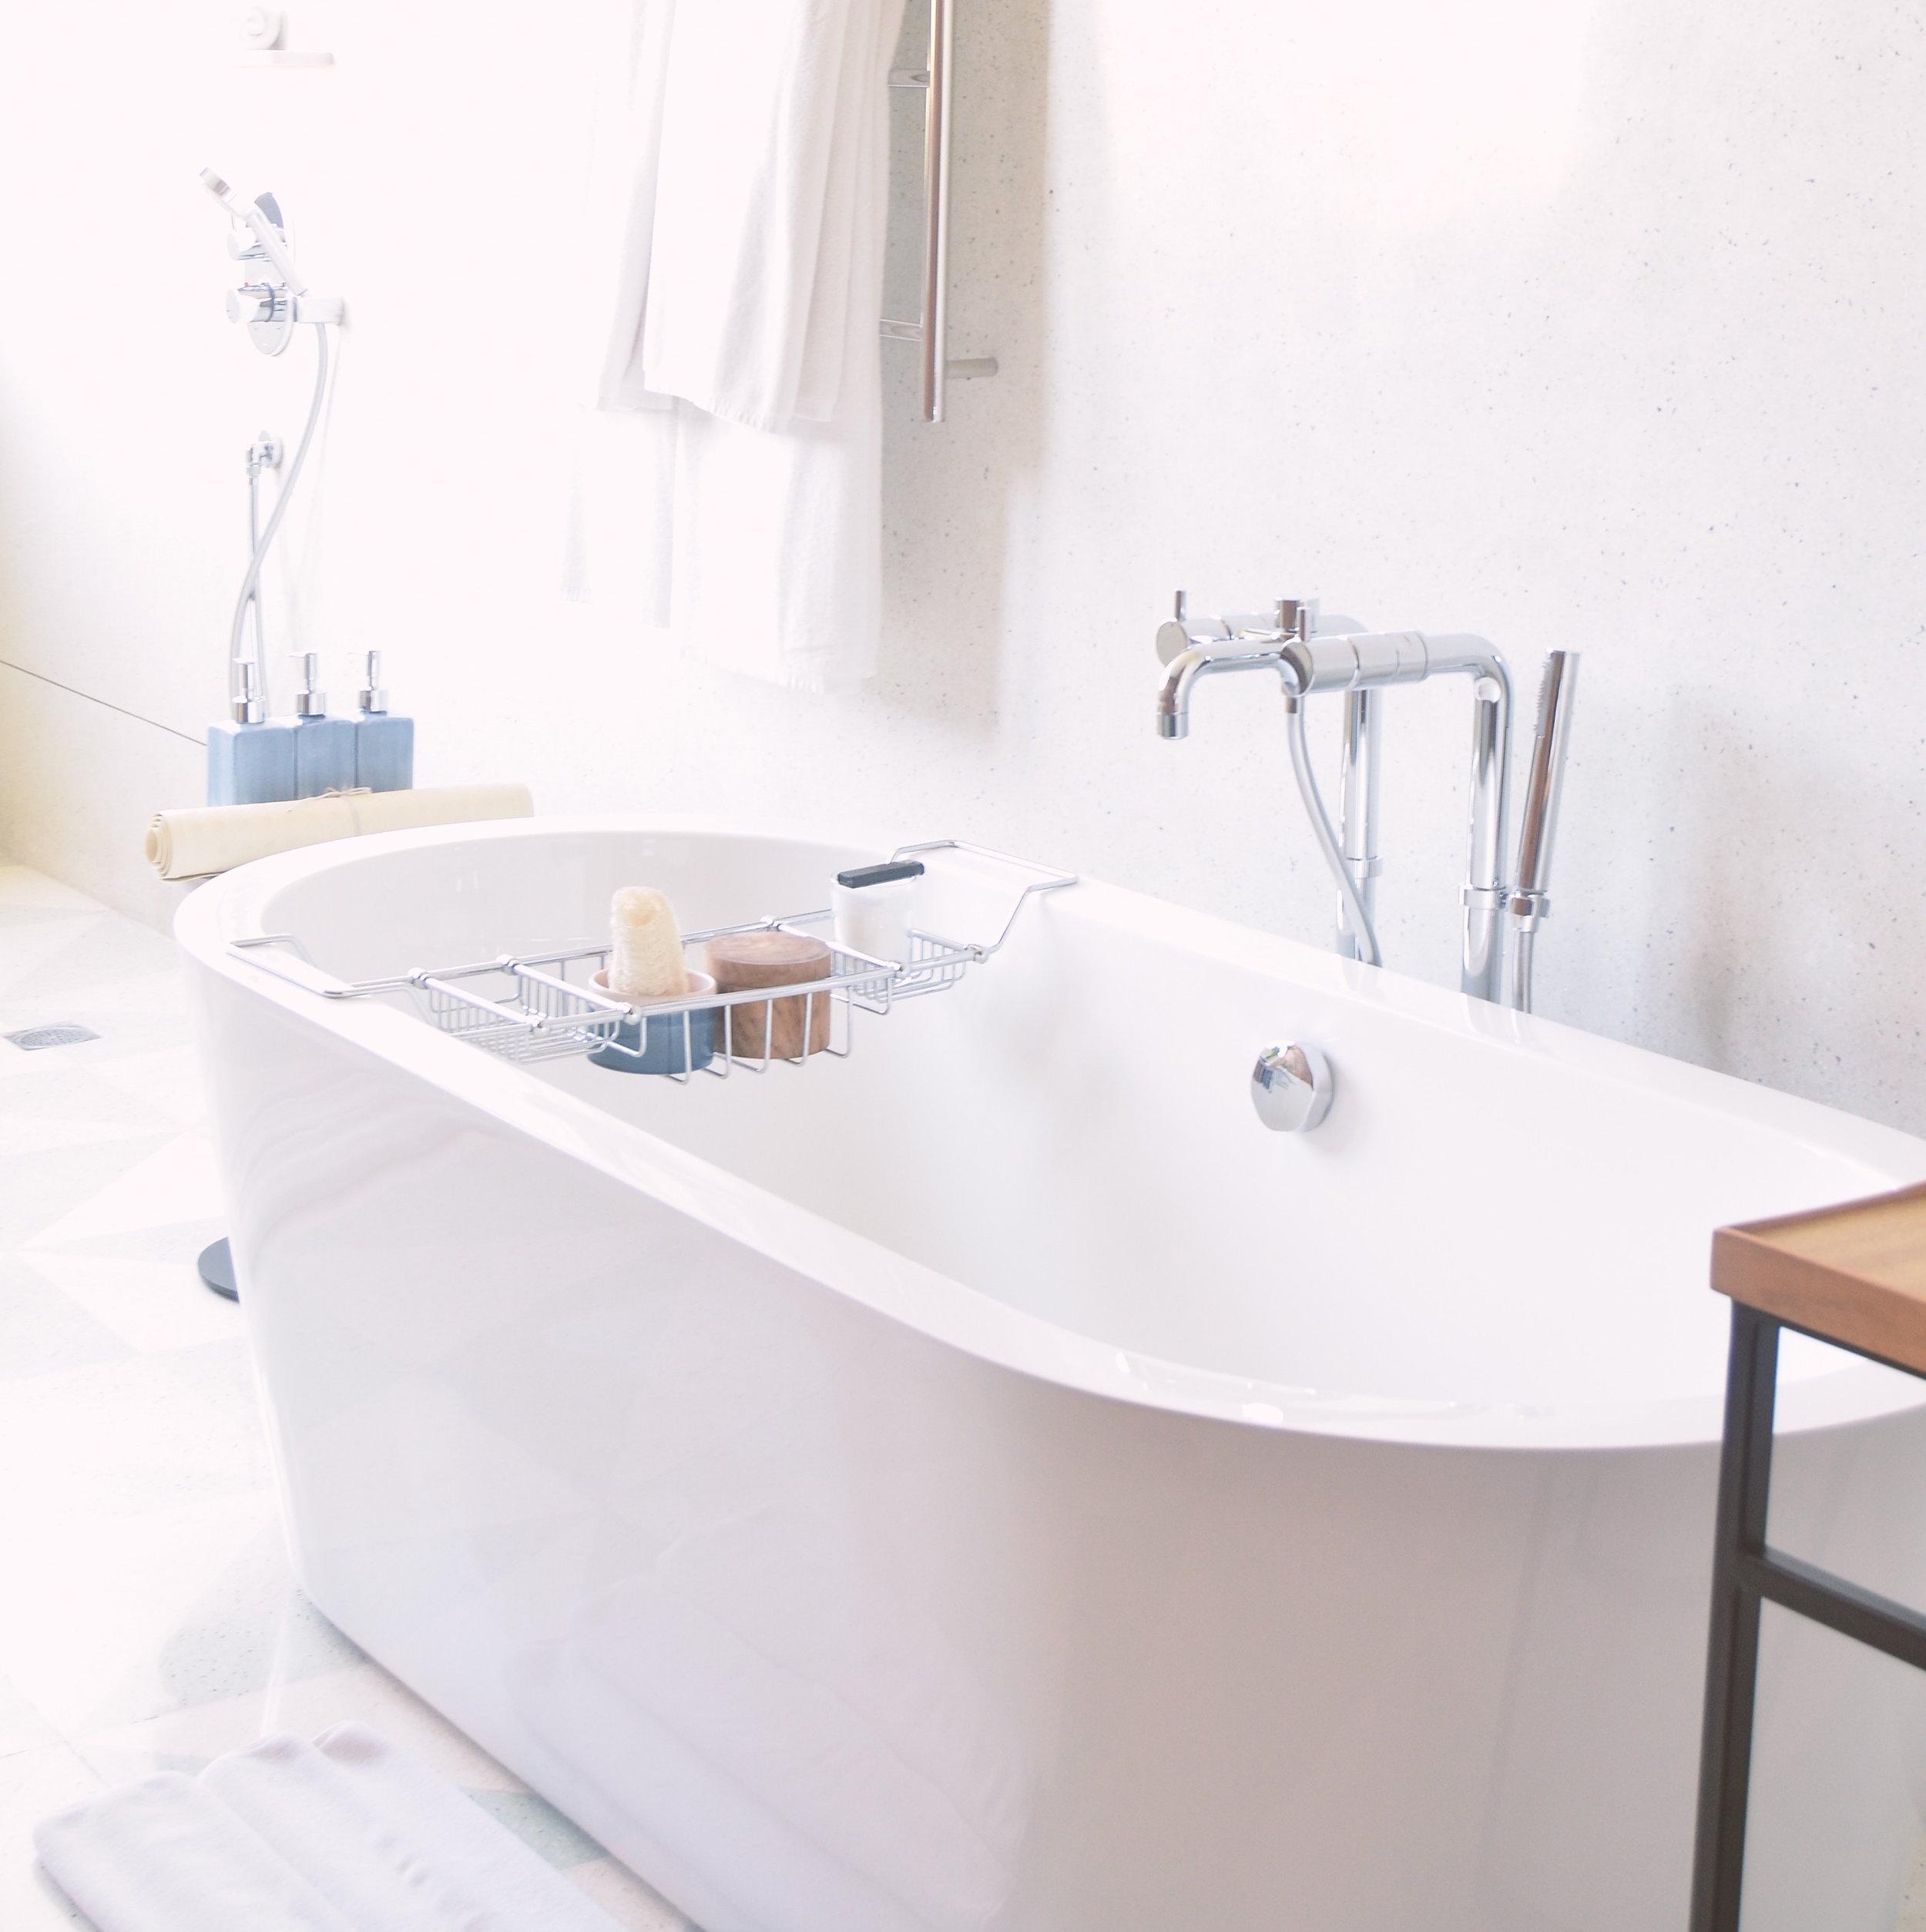 Epsom Salt and essential oil bath soak